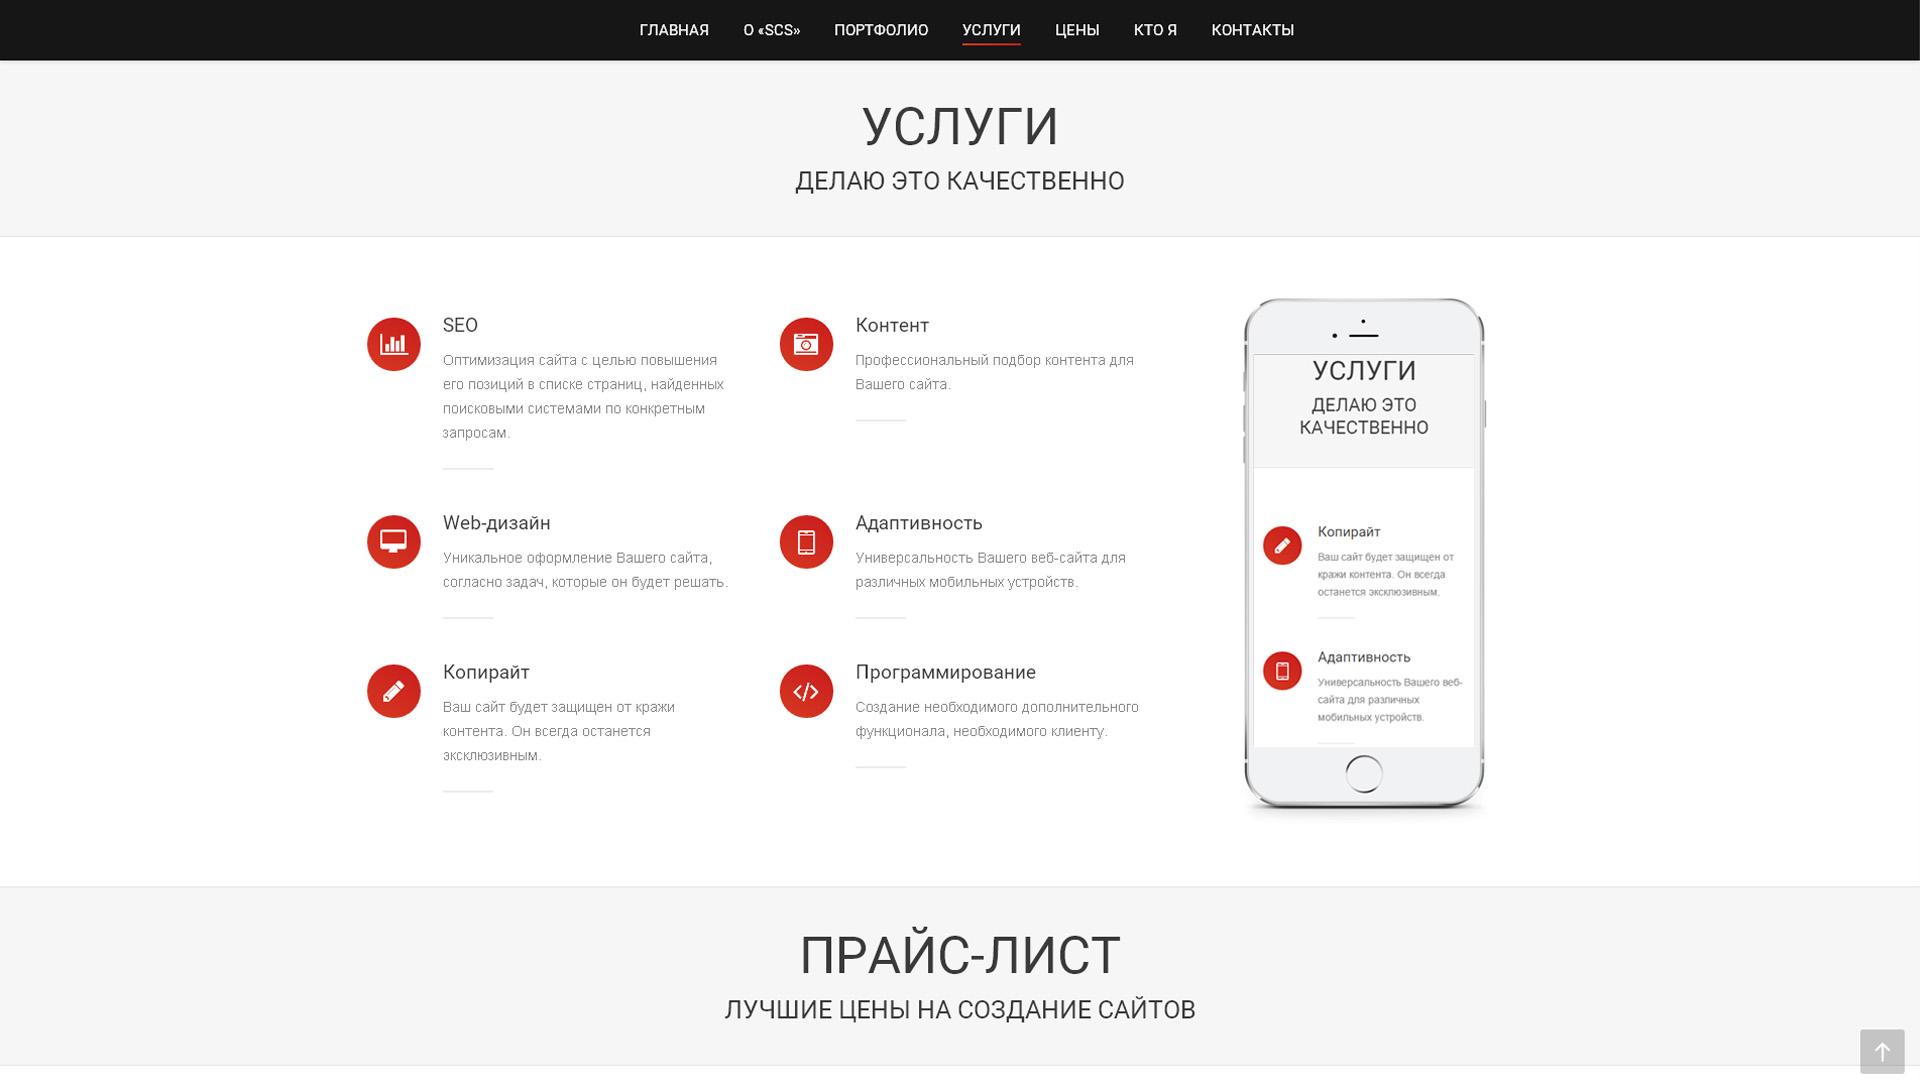 Страница сайта Услуги